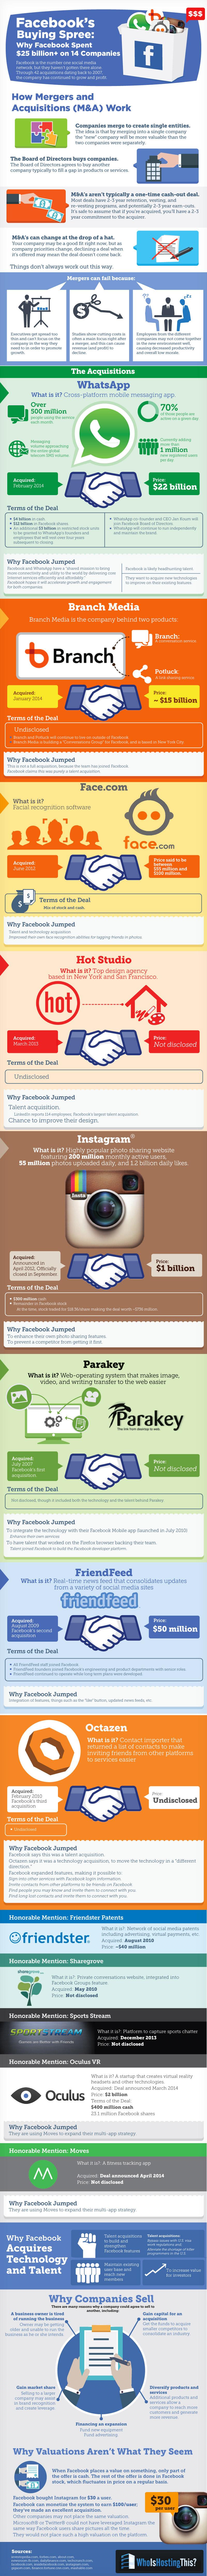 Facebook acquistion